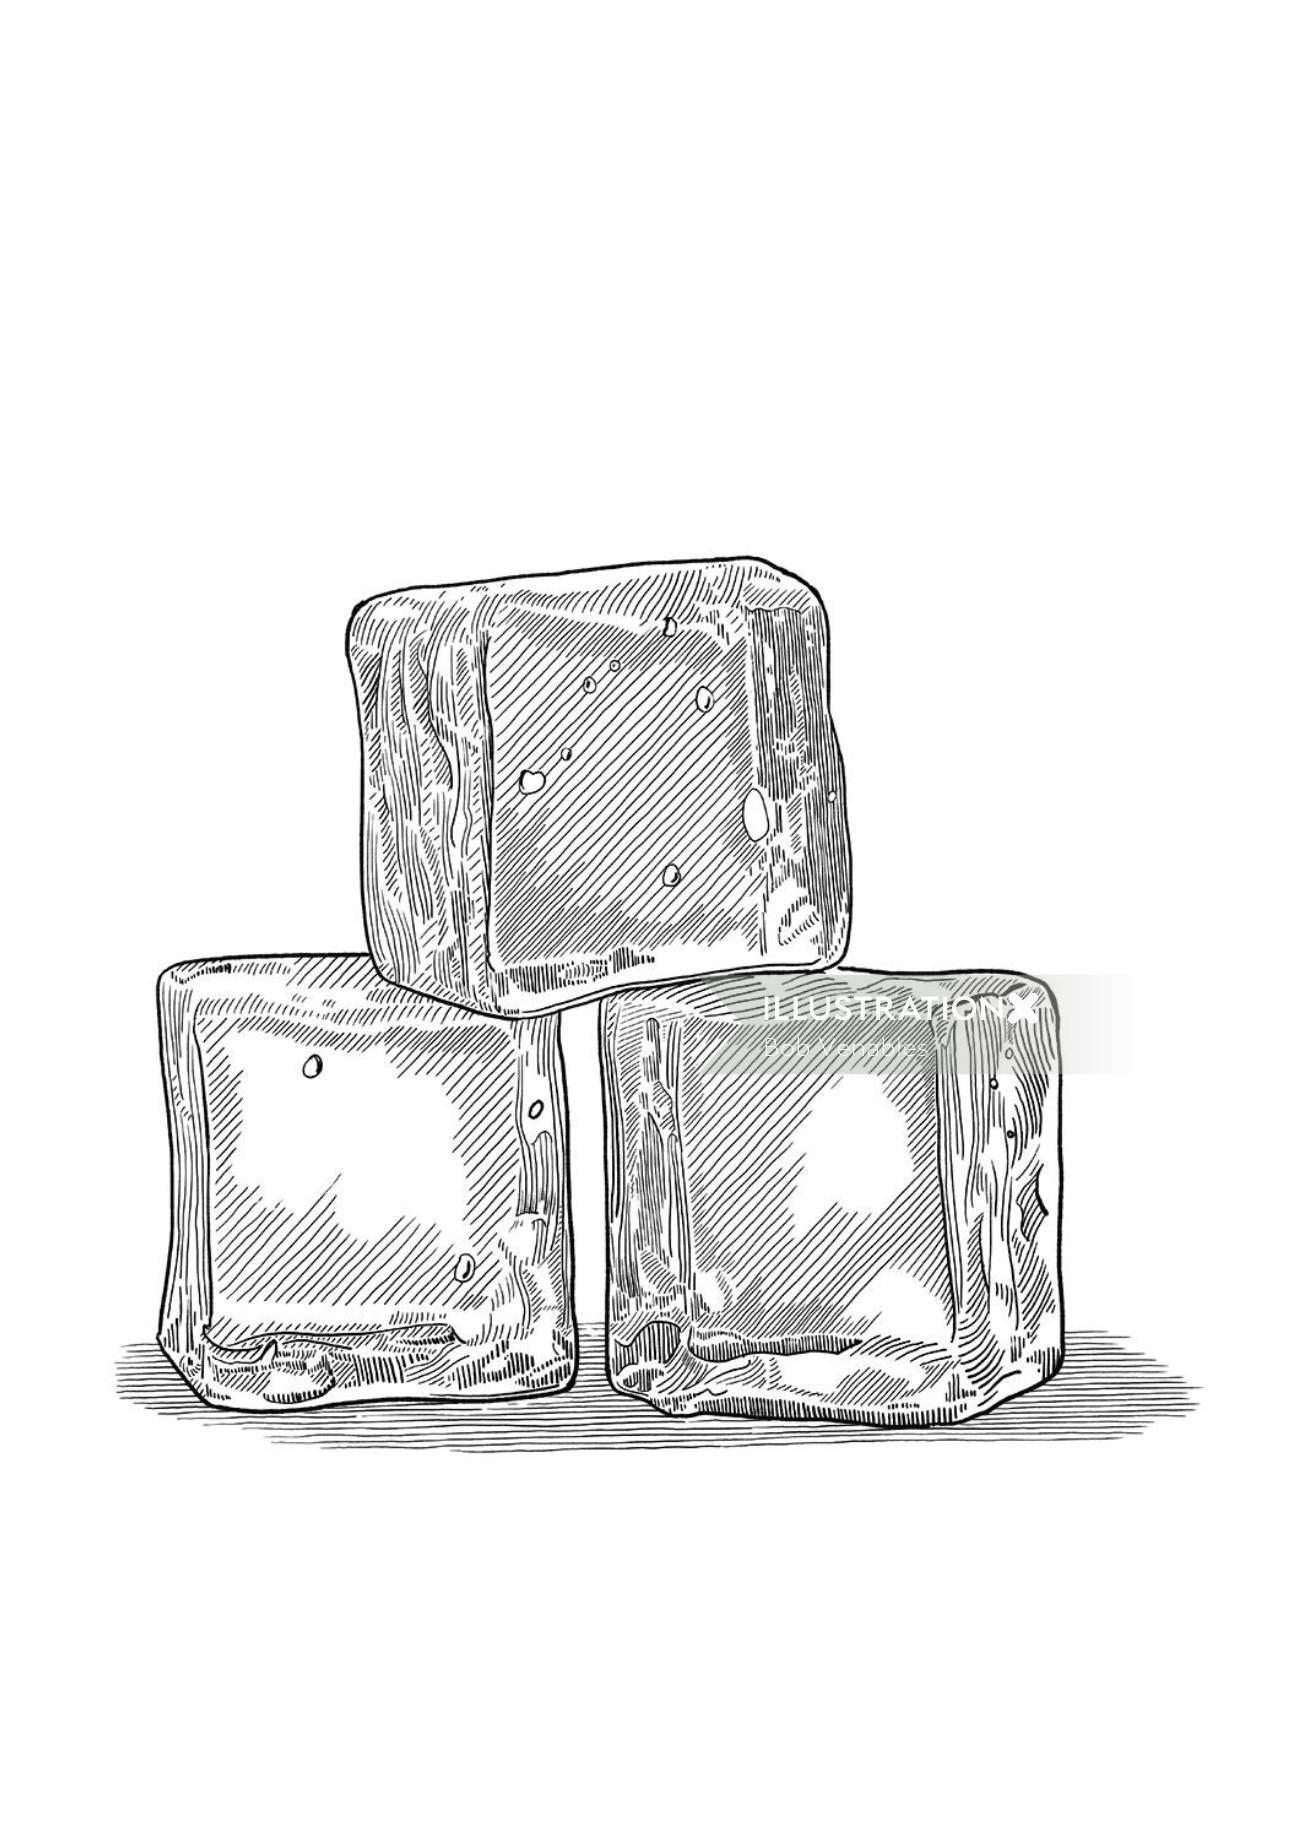 Ice cubes black and white illustration